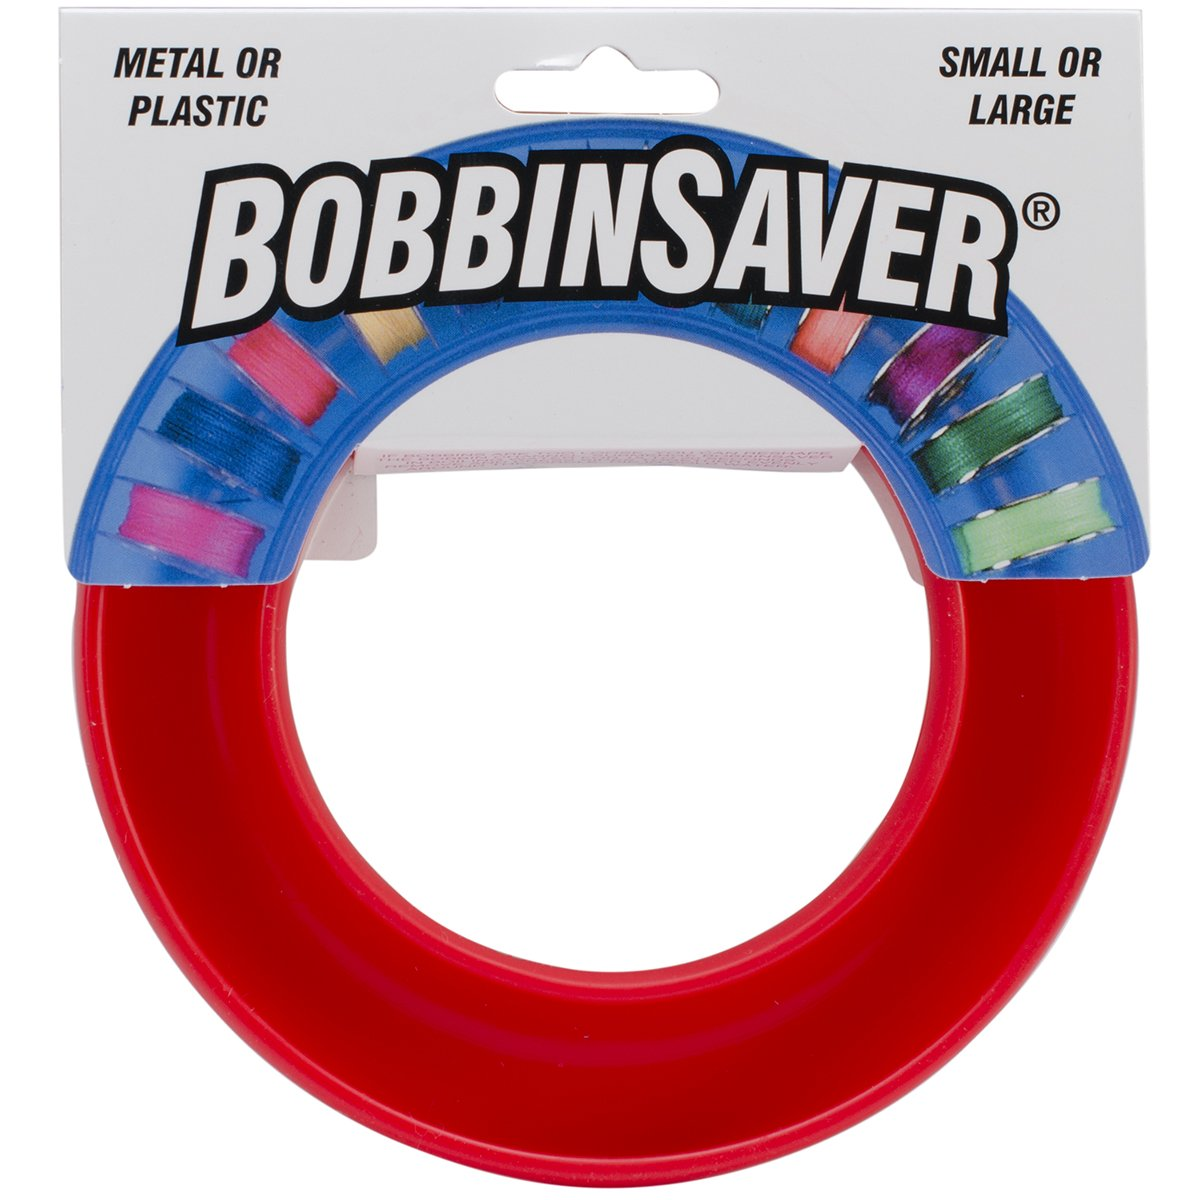 BobbinSaver Sewing Machine Bobbin Organizer - Holds 20+ Bobbins - Red product image